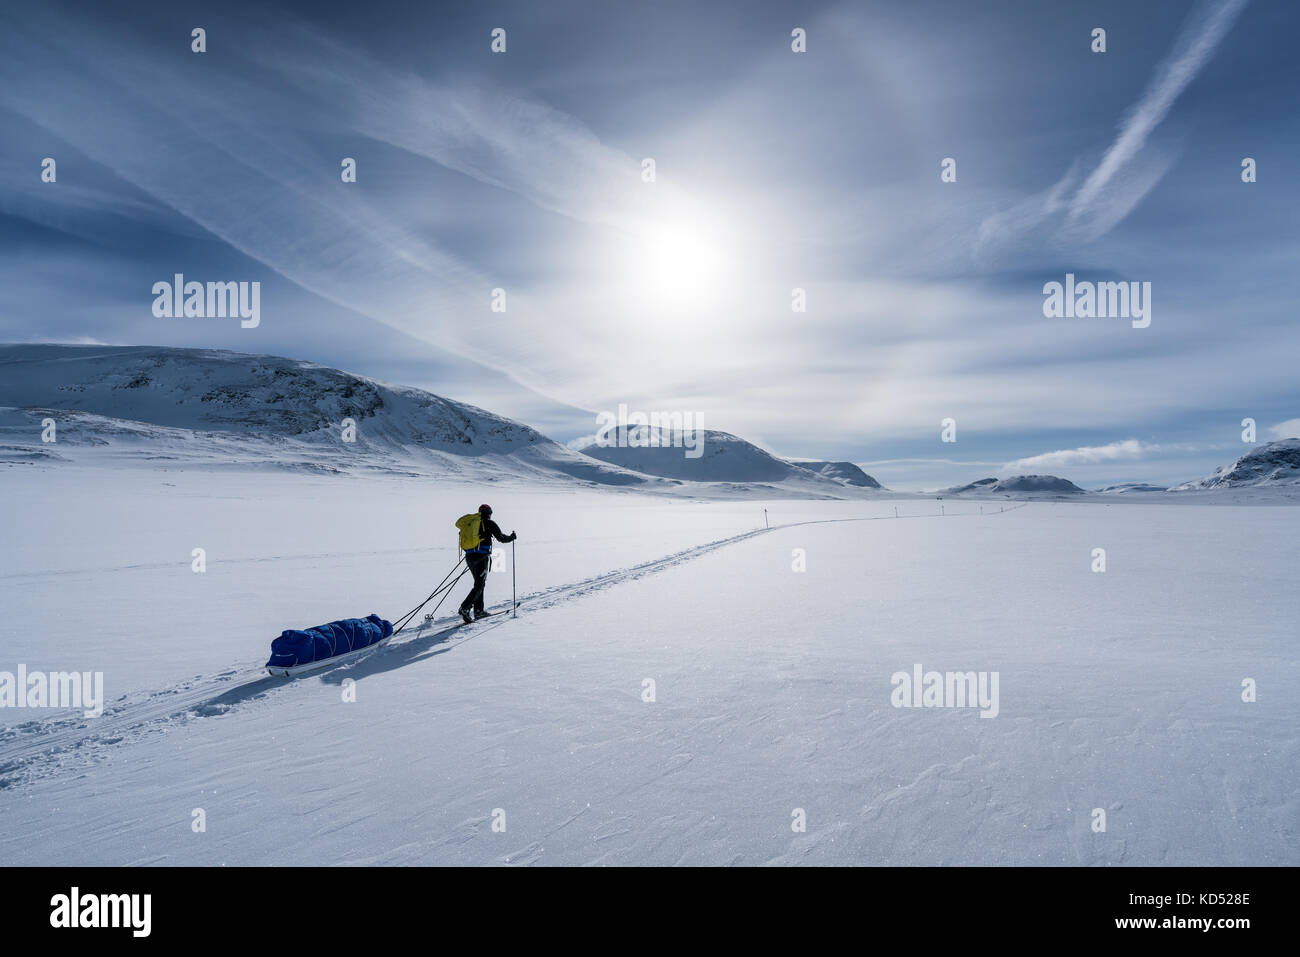 Ski touring in the Kebnekaise massive mountain range, Kiiruna, Sweden, Europe - Stock Image